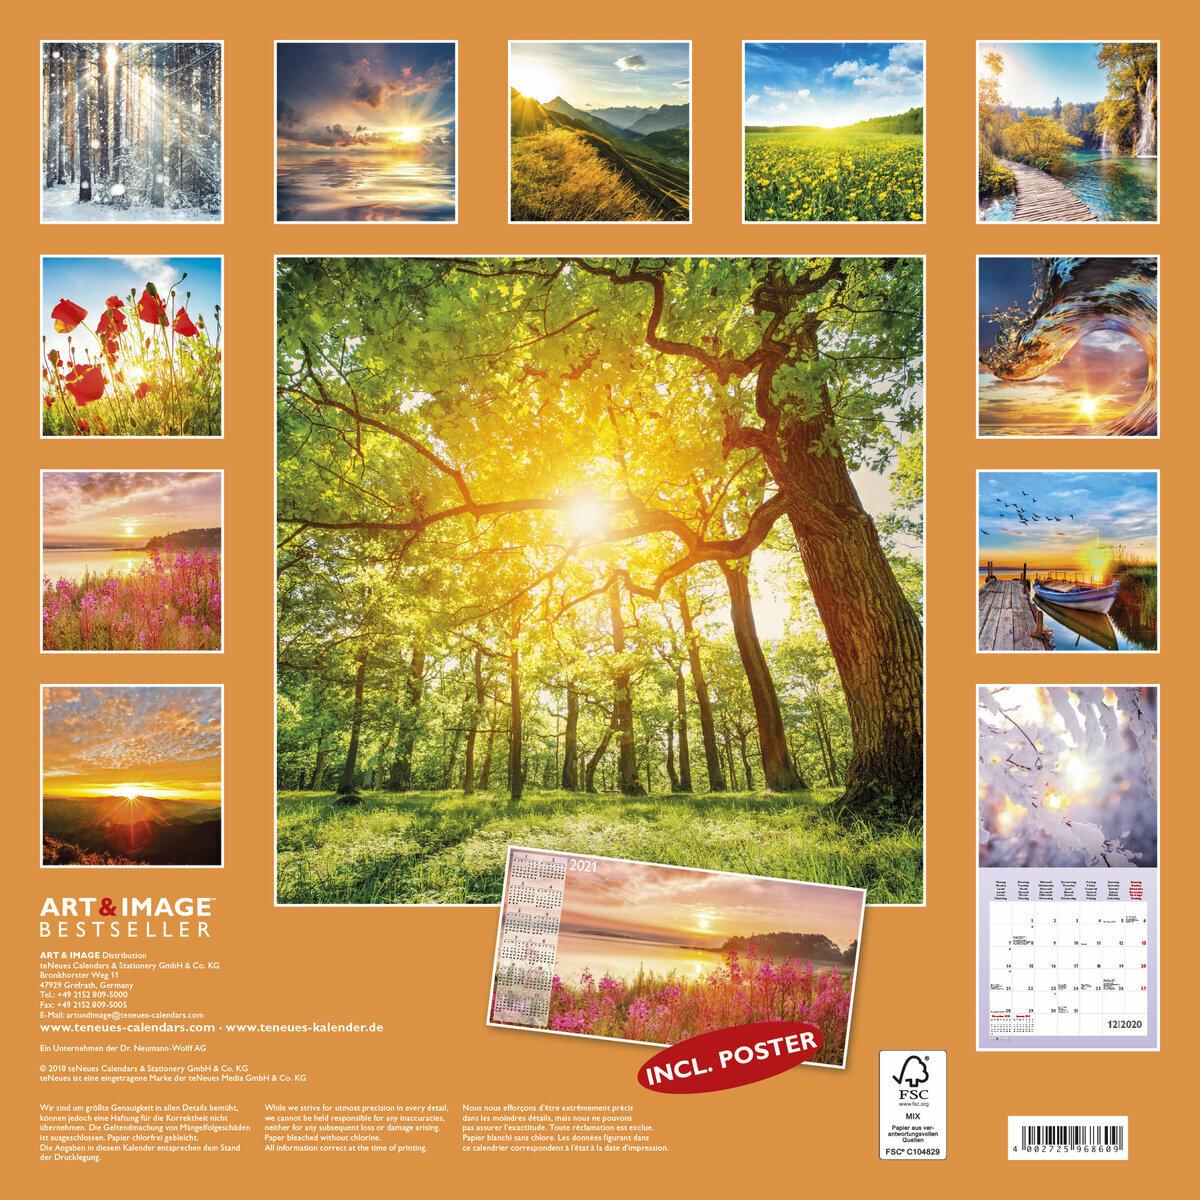 Calendrier 2020 Avec Photos.Calendrier 2020 Paysage Ensoleille Avec Poster Offert